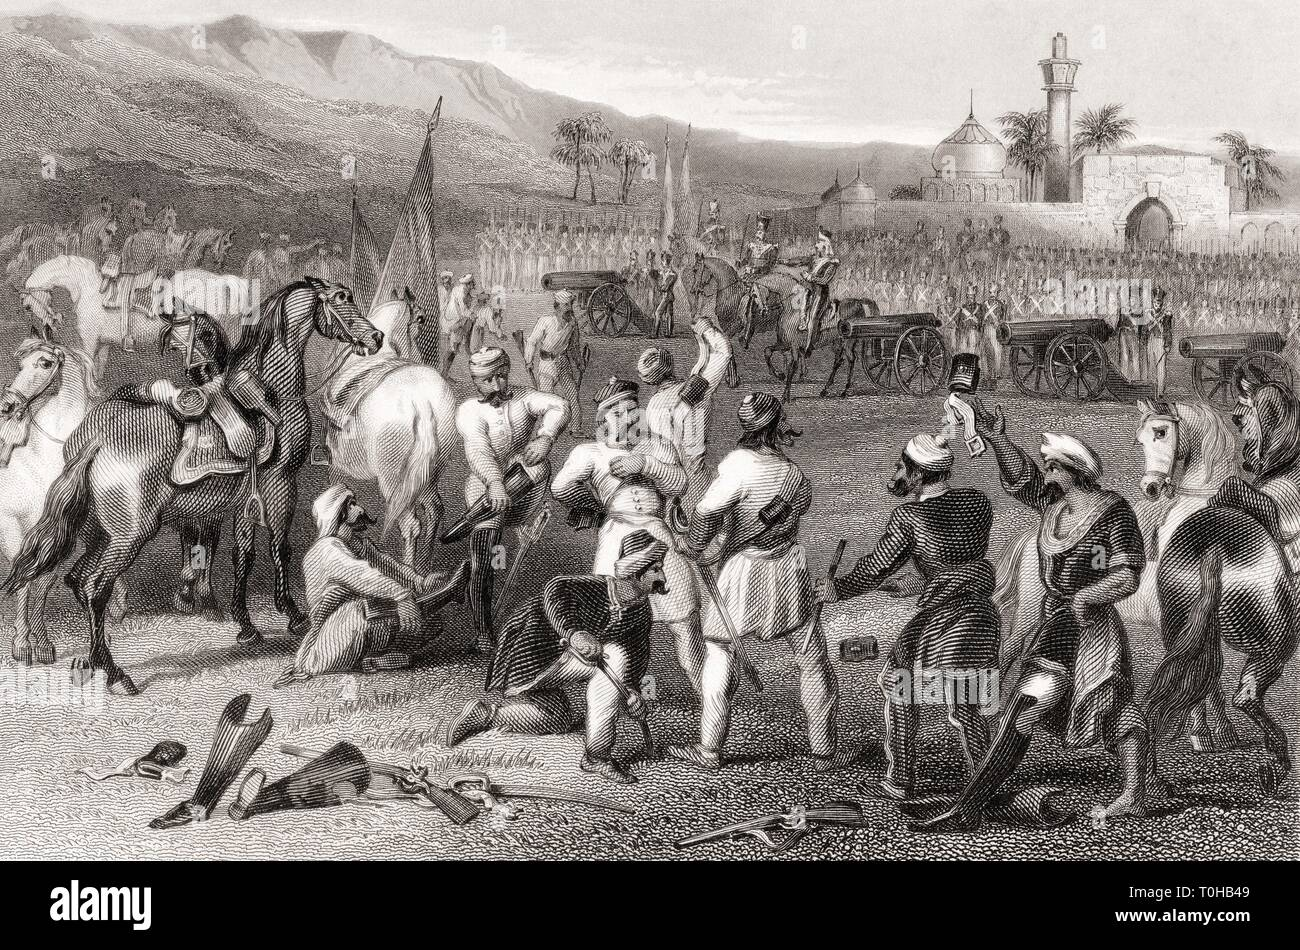 Disarming 11th Irregular Cavalry, Berhampore, India, Asia, 1857 Stock Photo